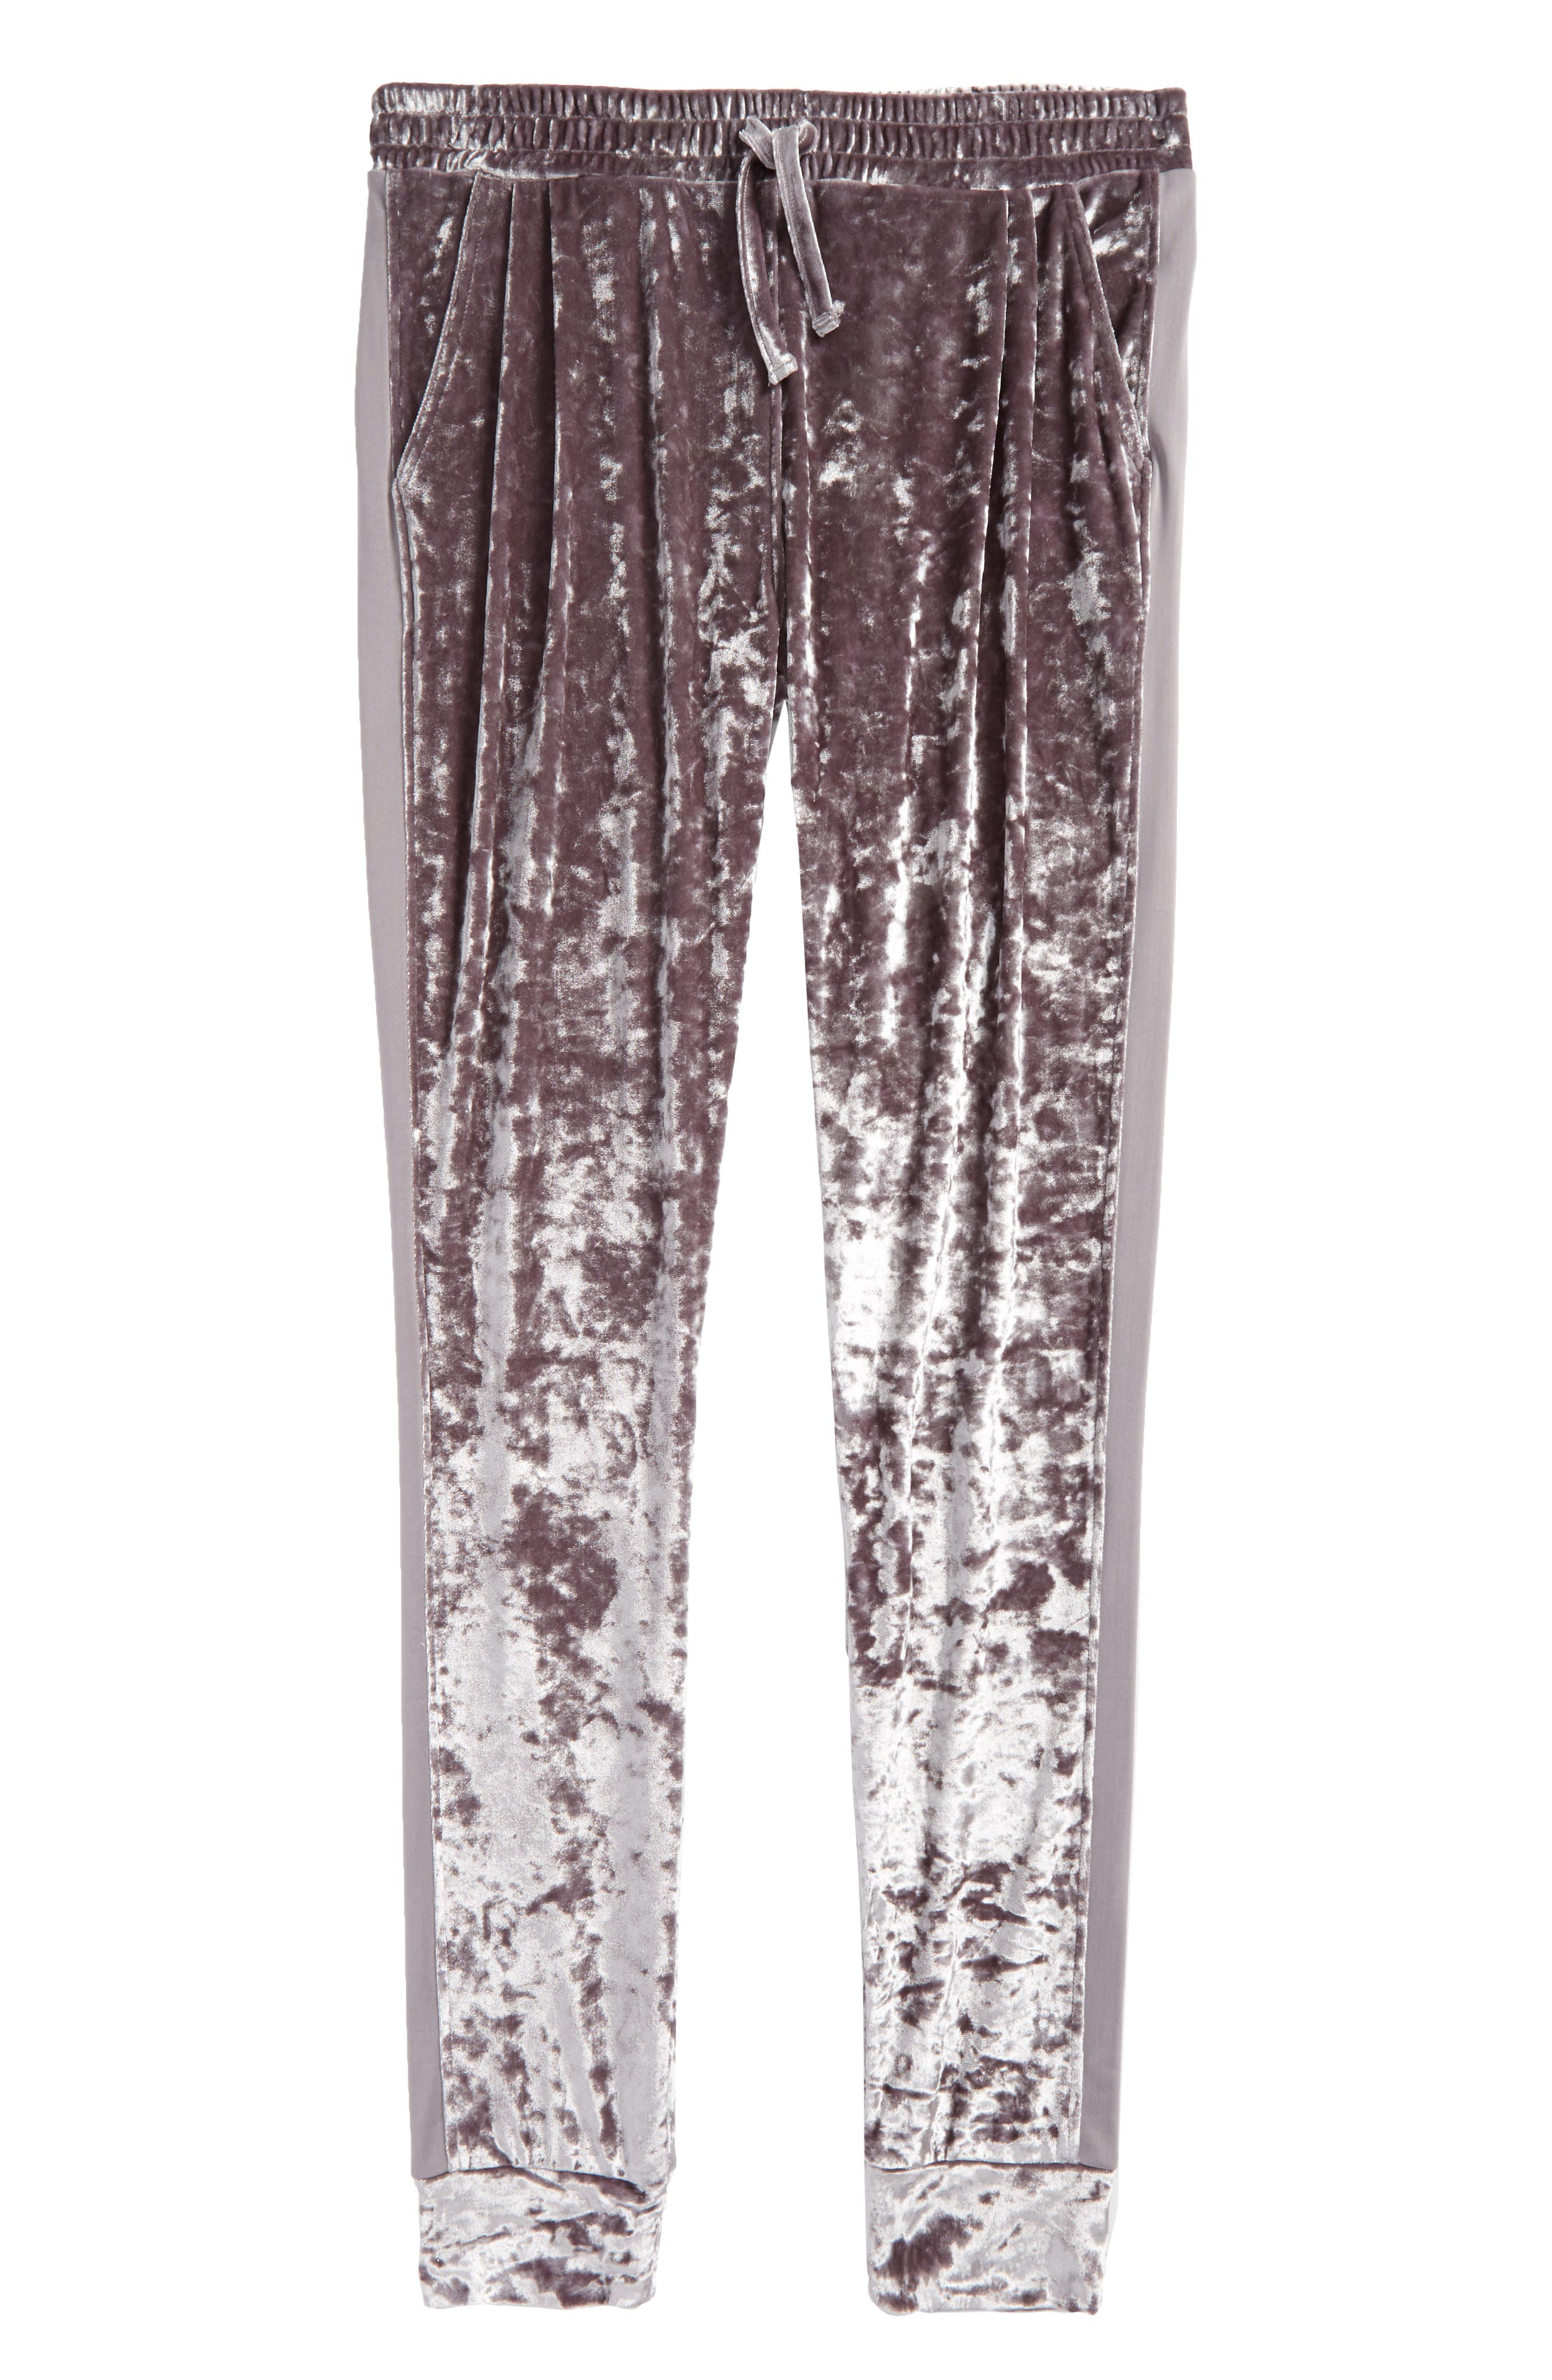 Alternate Image 1 Selected - Treasure & Bond Velour Jogger Pants (Big Girls)